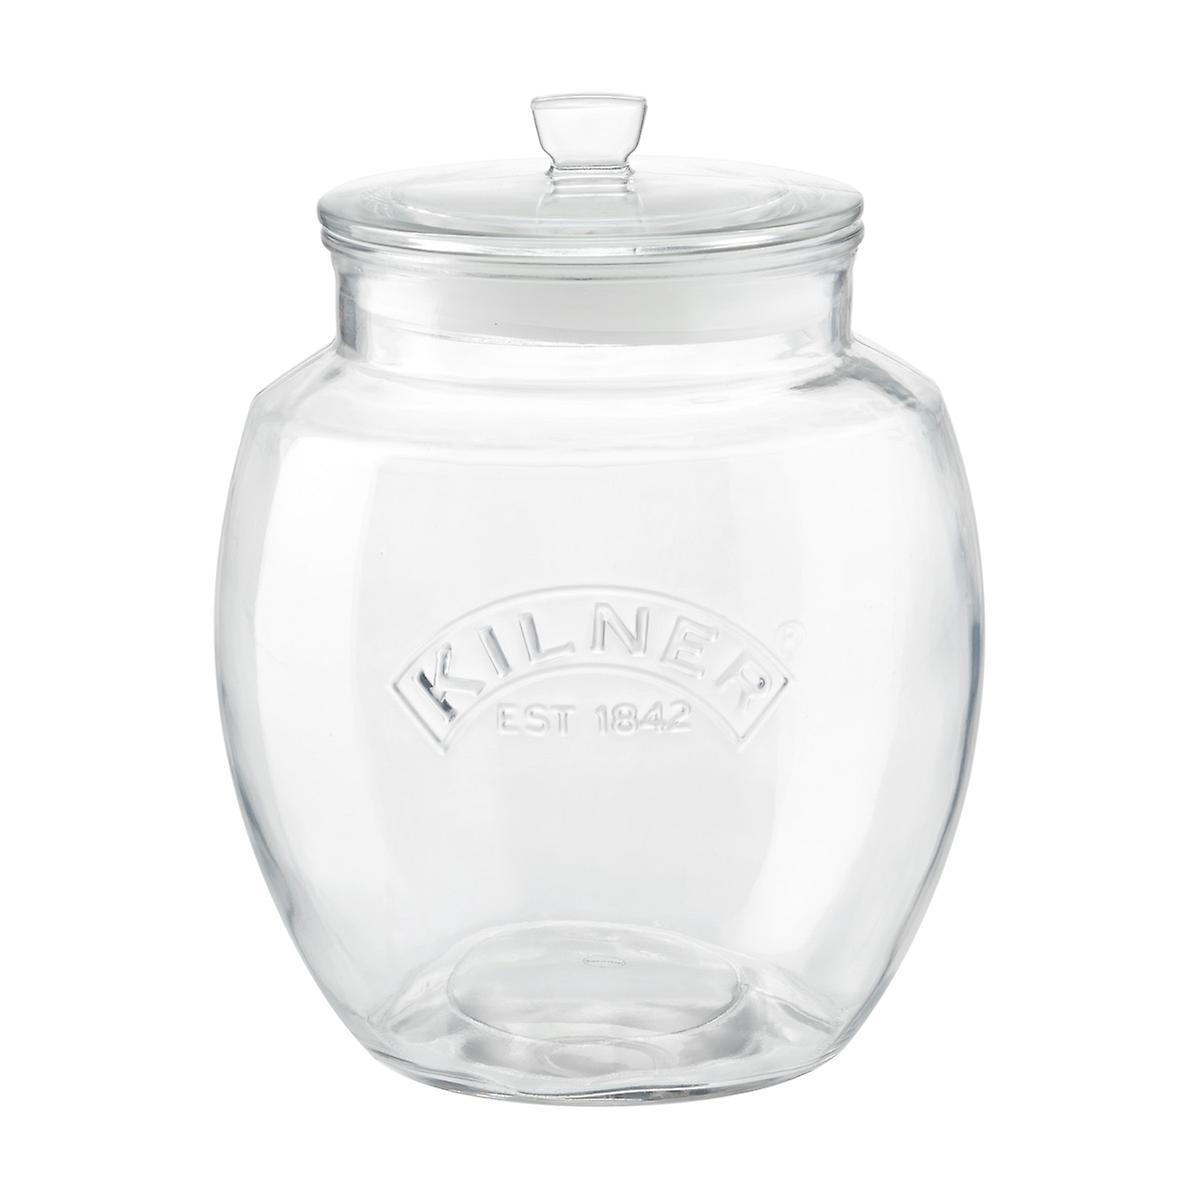 Kilner Universal Glass Storage Jars; &; &. Roll over to zoom